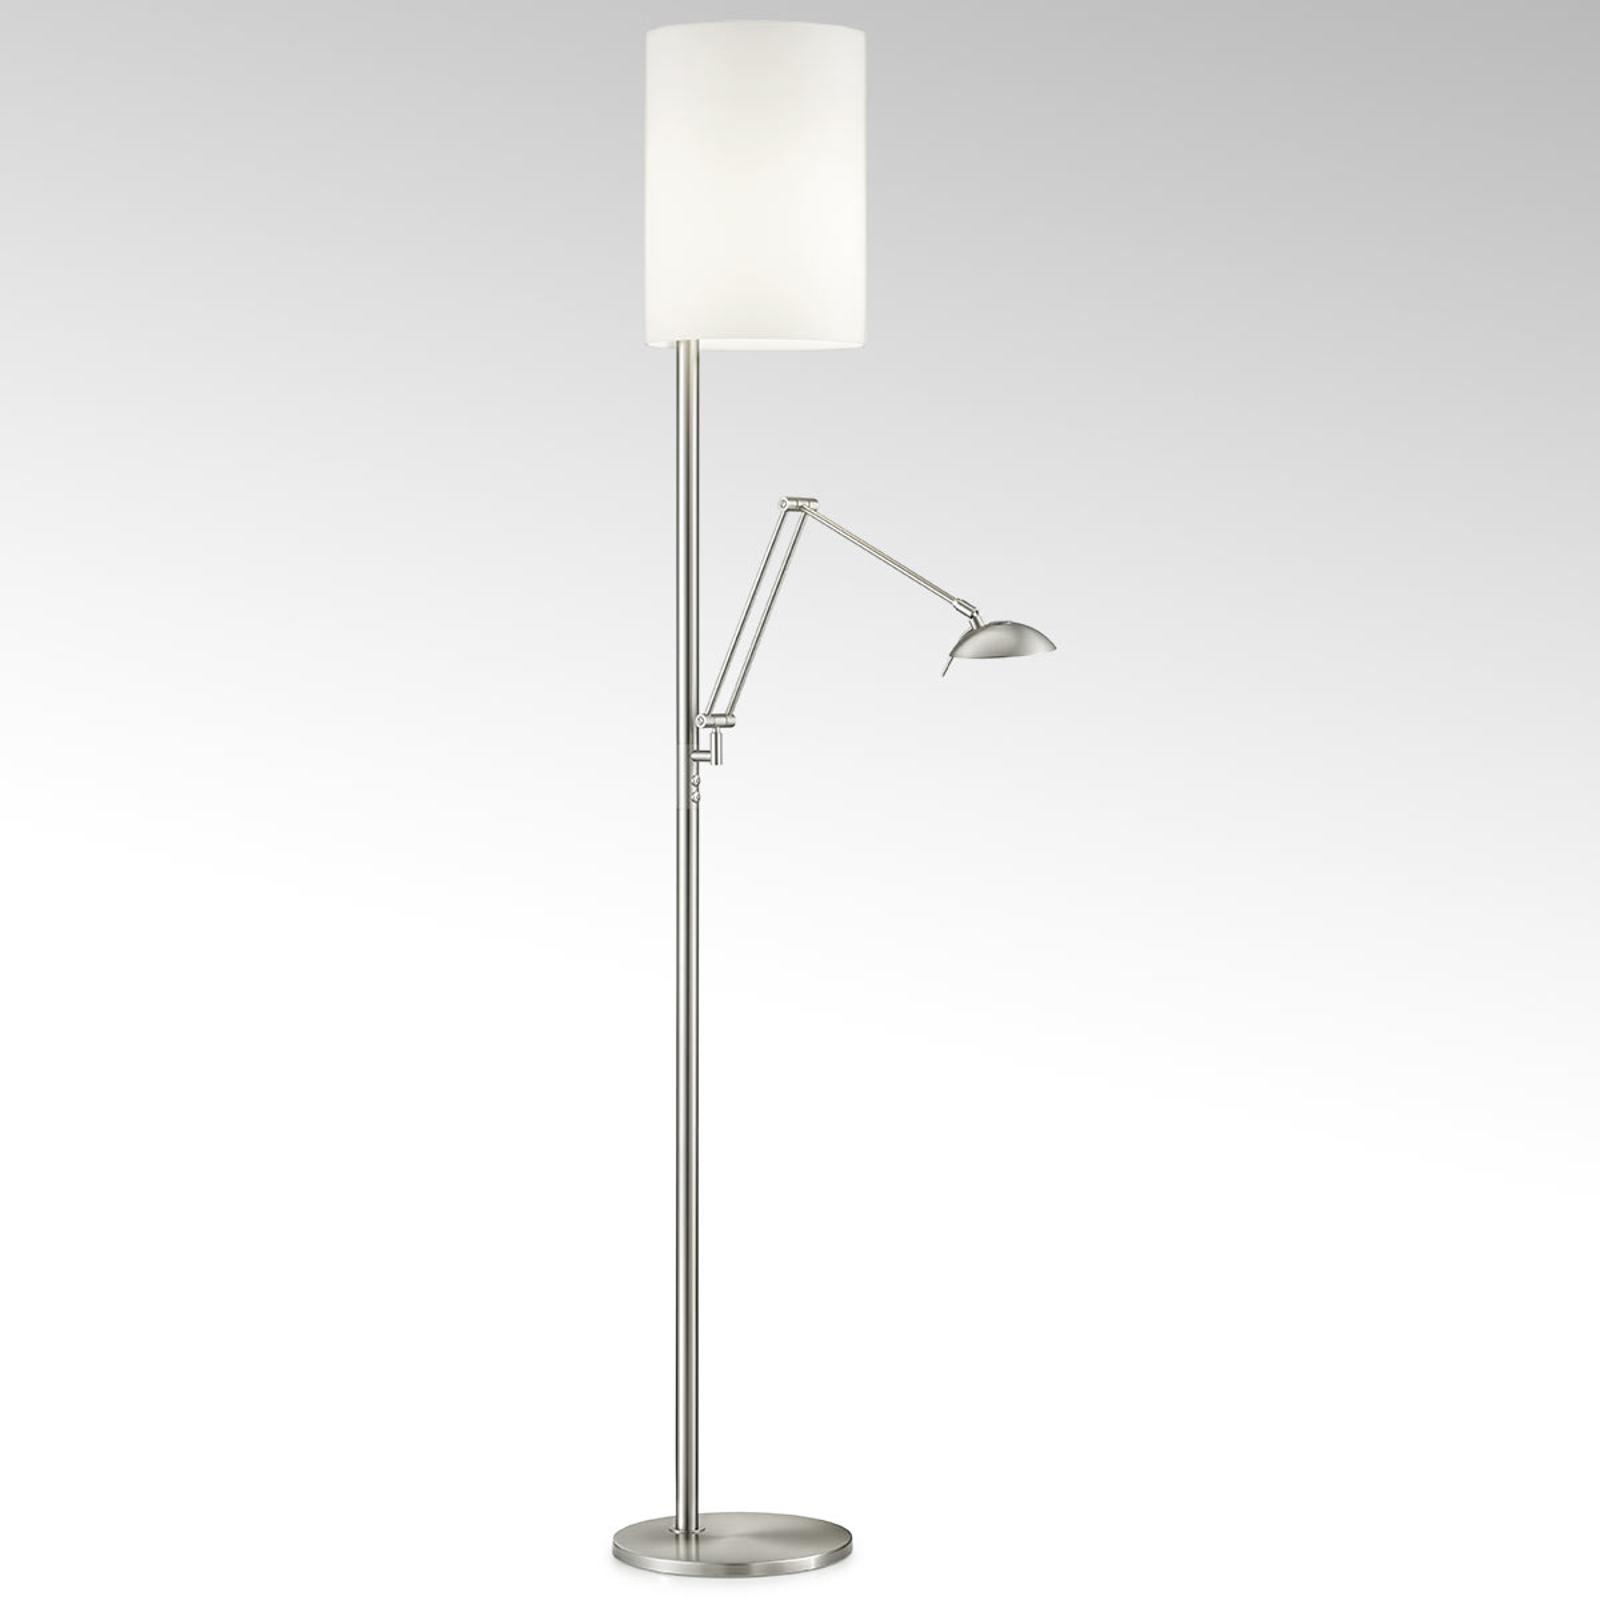 LED vloerlamp Nola mat nikkel